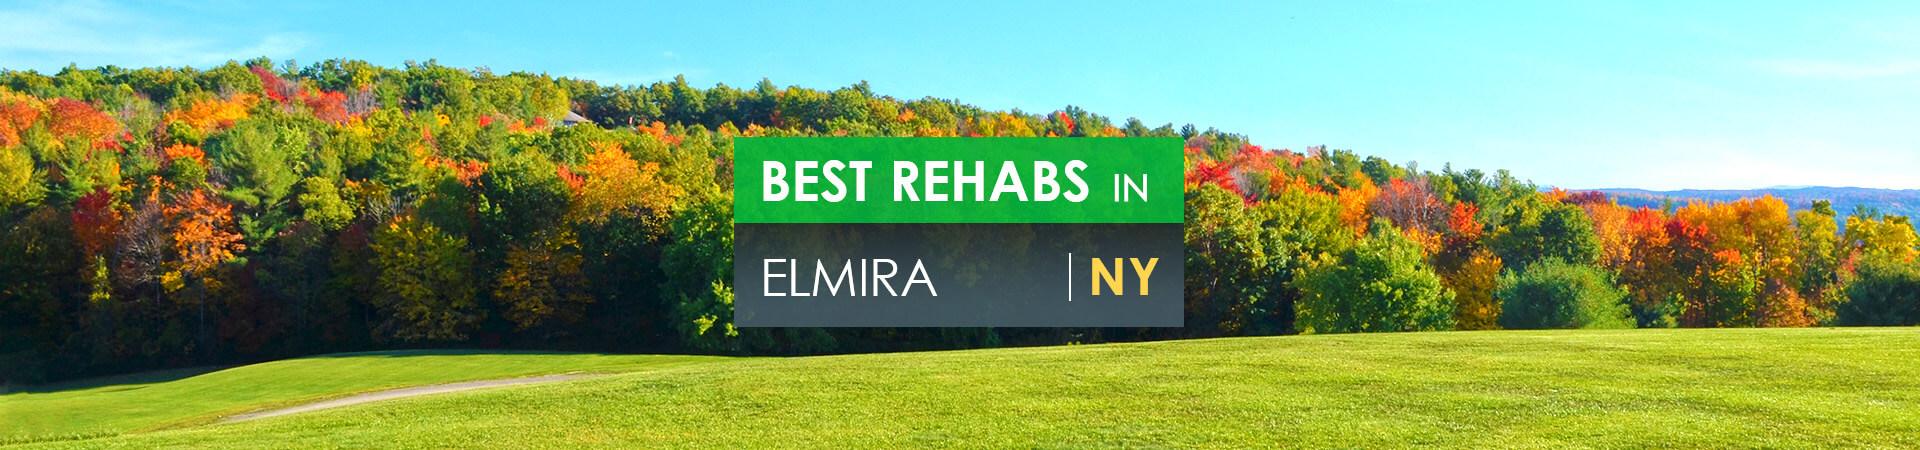 Best rehabs in Elmira, NY